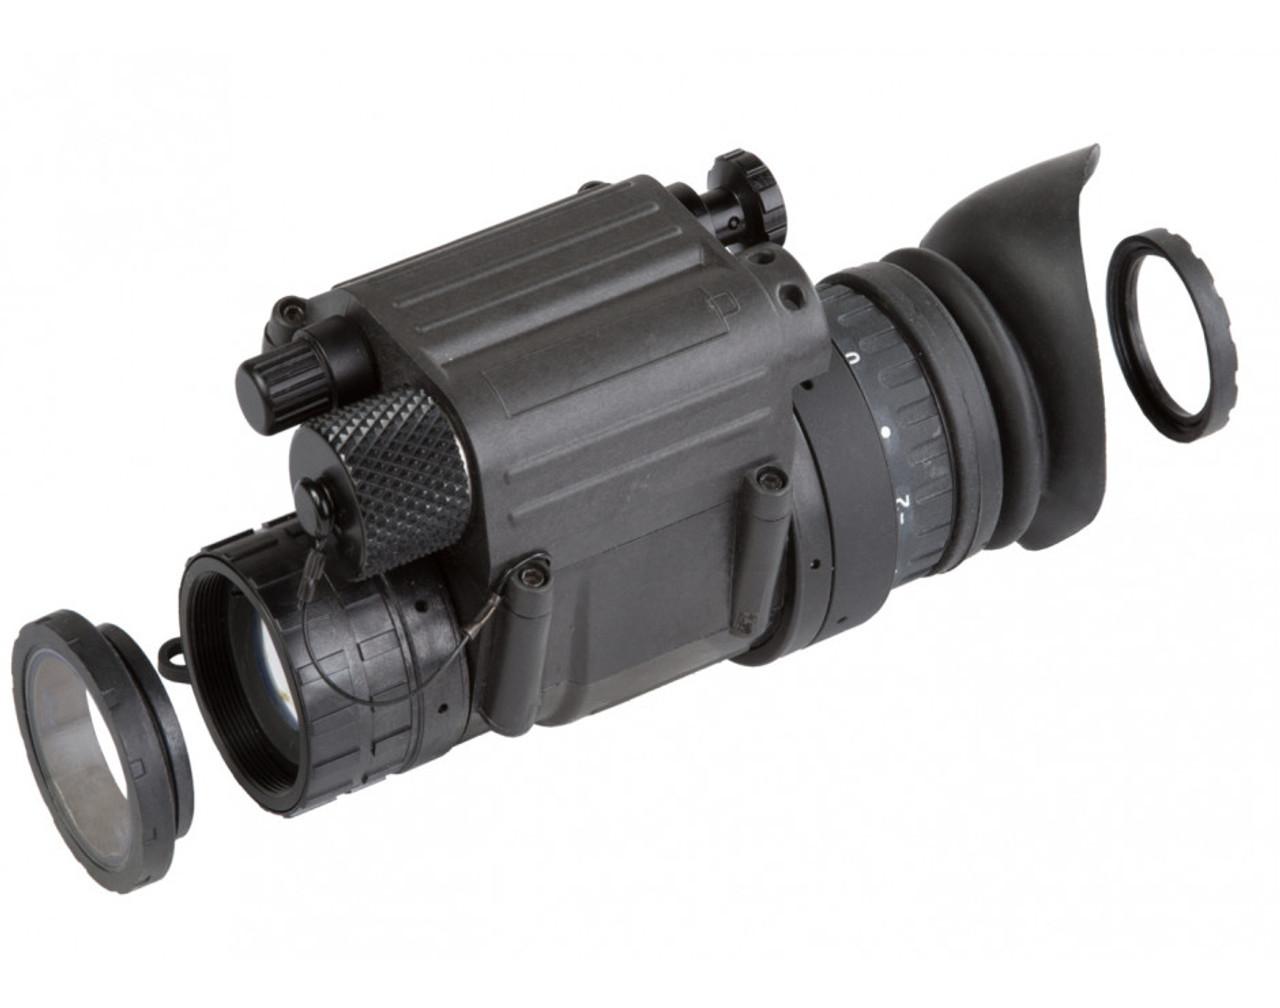 "AGM PVS-14 3AW3 Night Vision Monocular Gen 3+ Auto-Gated ""White Phosphor Level 3"" (AGM PVS-14 3AW3)"